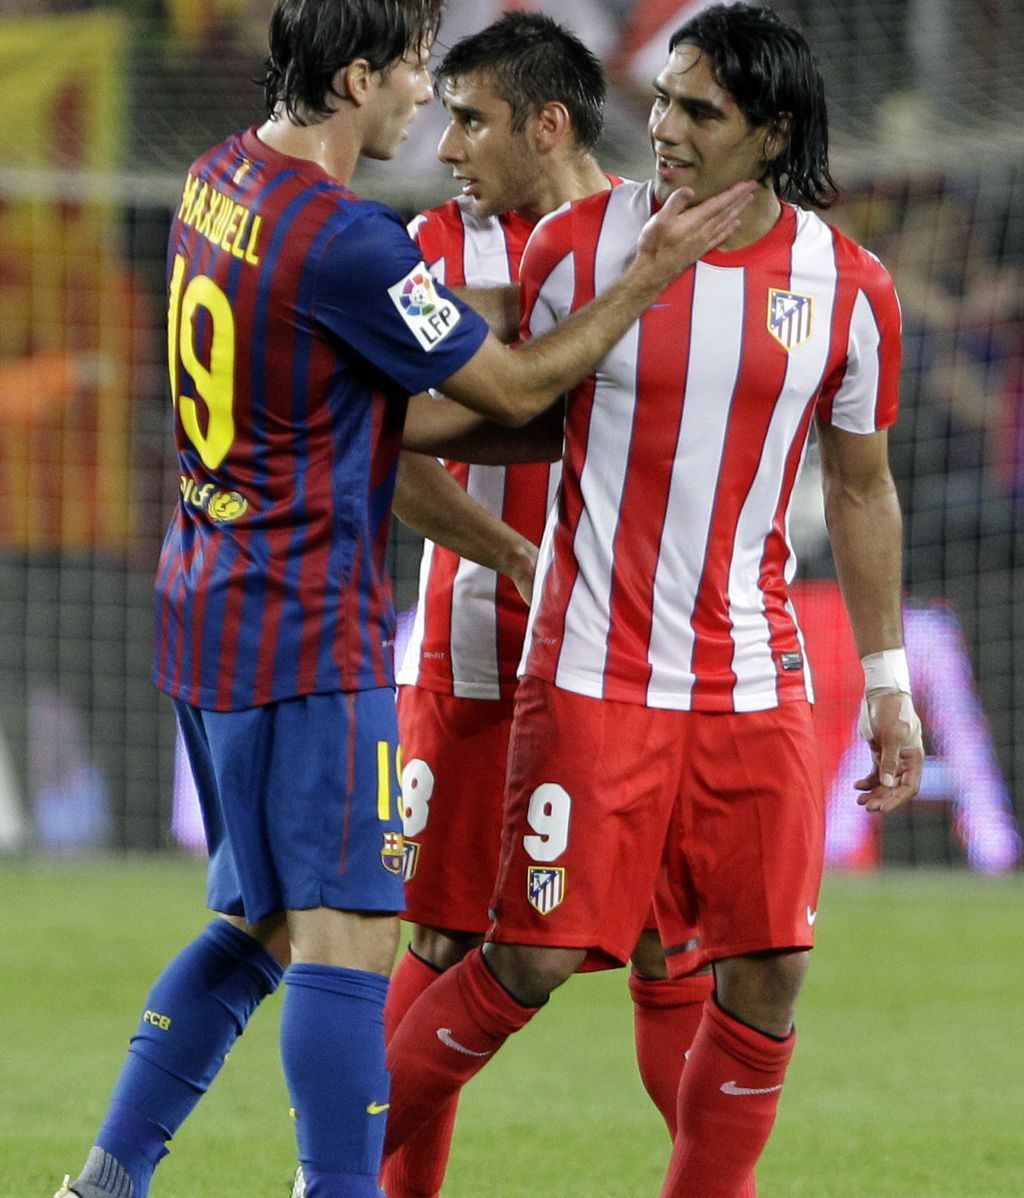 El jugador del Barcelona Maxwell con el jugador del Atlético de Madrid Falçao